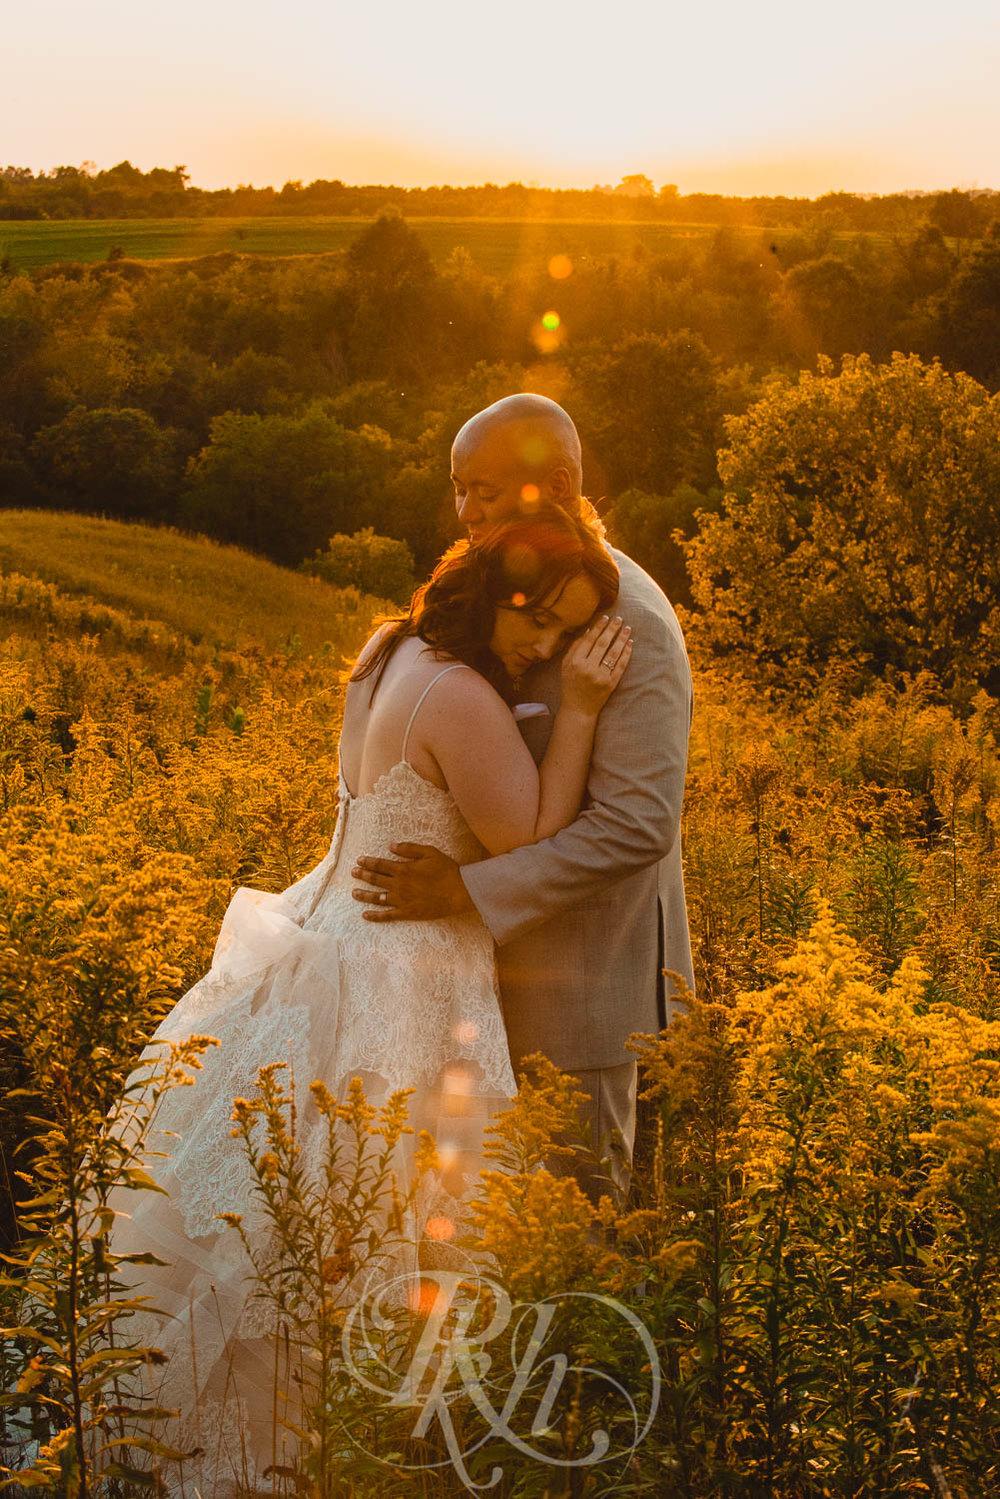 Christy & Matt - Wisconsin Wedding Photography - Birch Hill Barn - RKH Images  (45 of 47).jpg